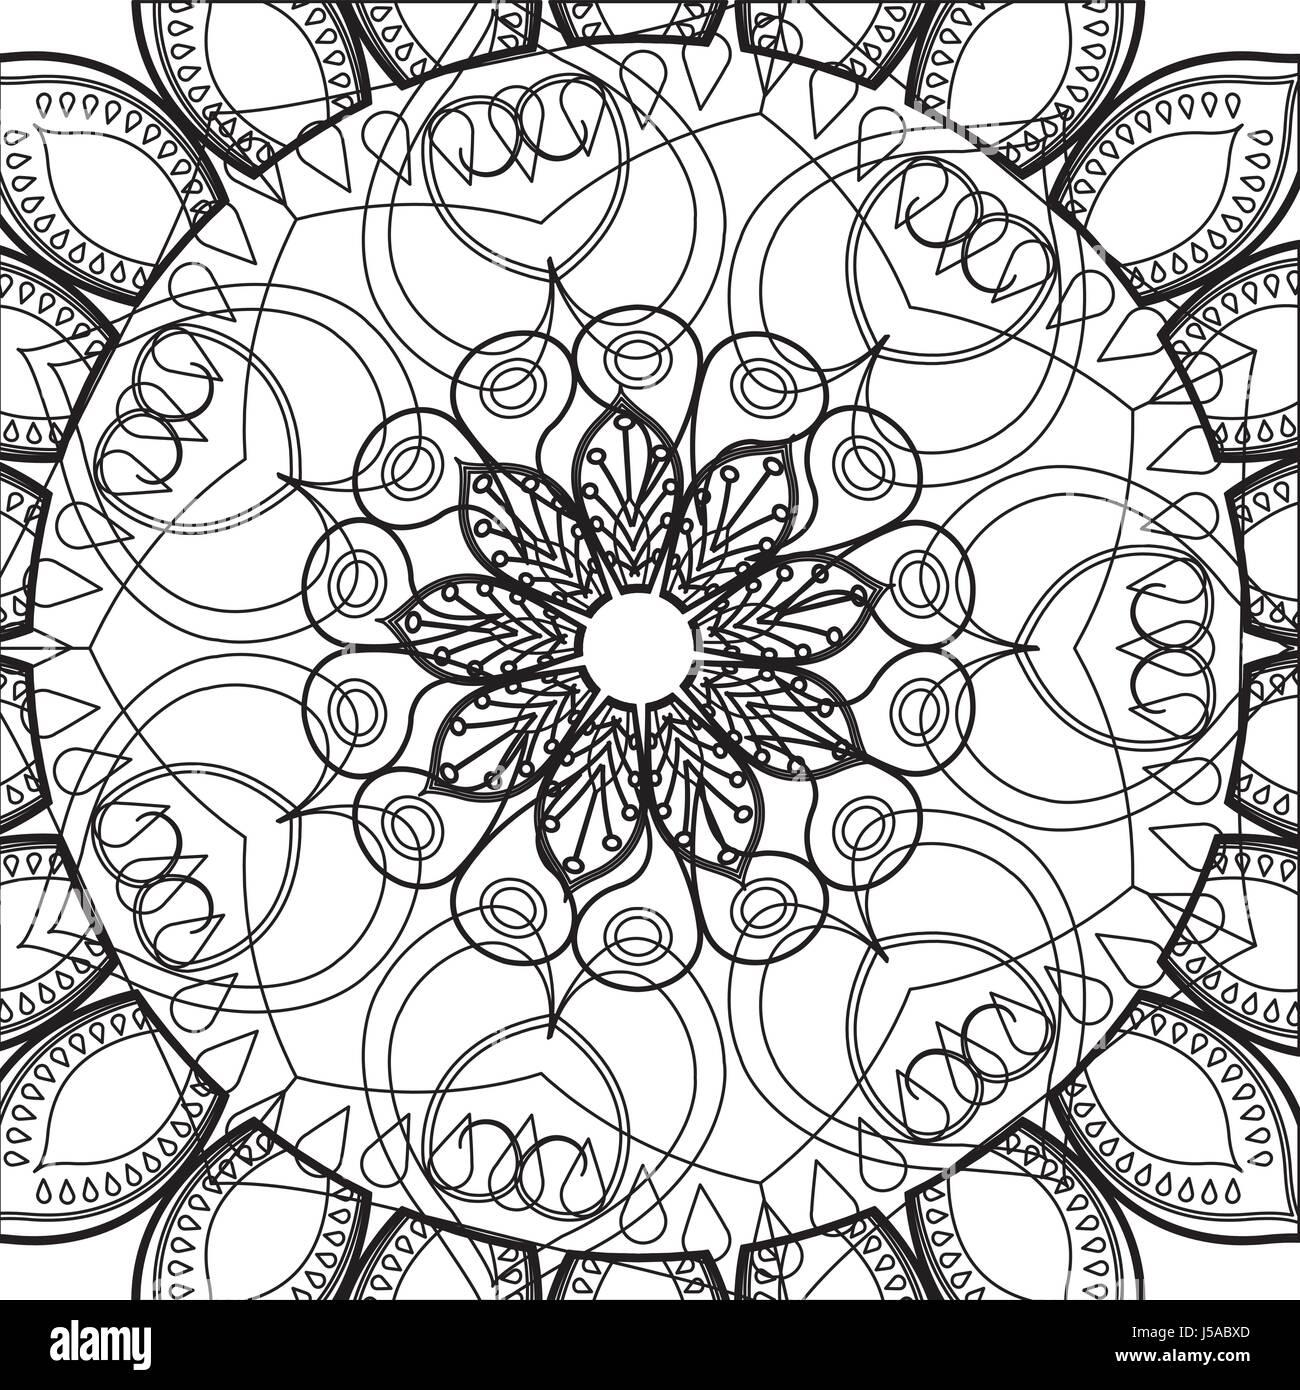 Mandala-ethnische detailliert, Entspannung Regelung Muster Stockbild